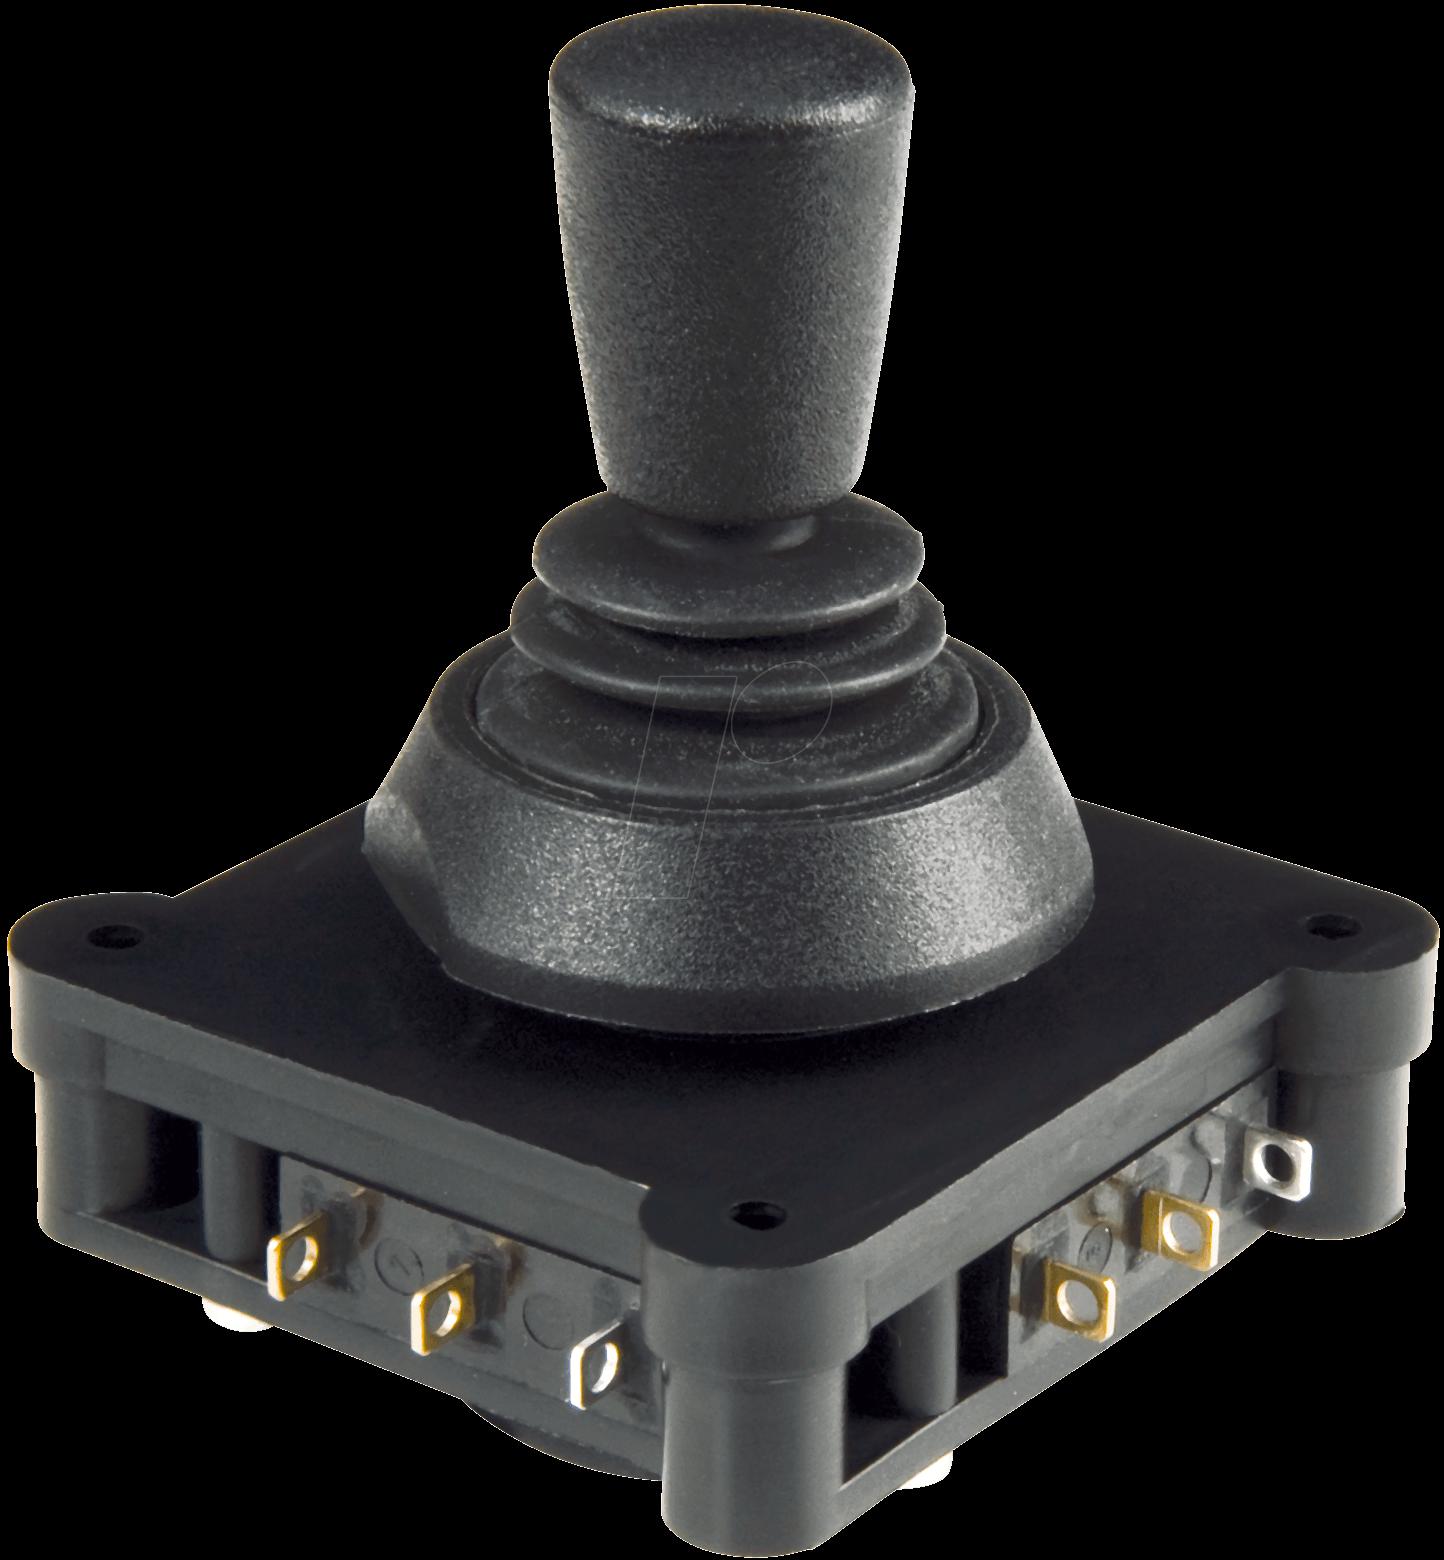 APEM GmbH APEM JOYSTICK MS - Microswitch Joystick (1D15F1500)